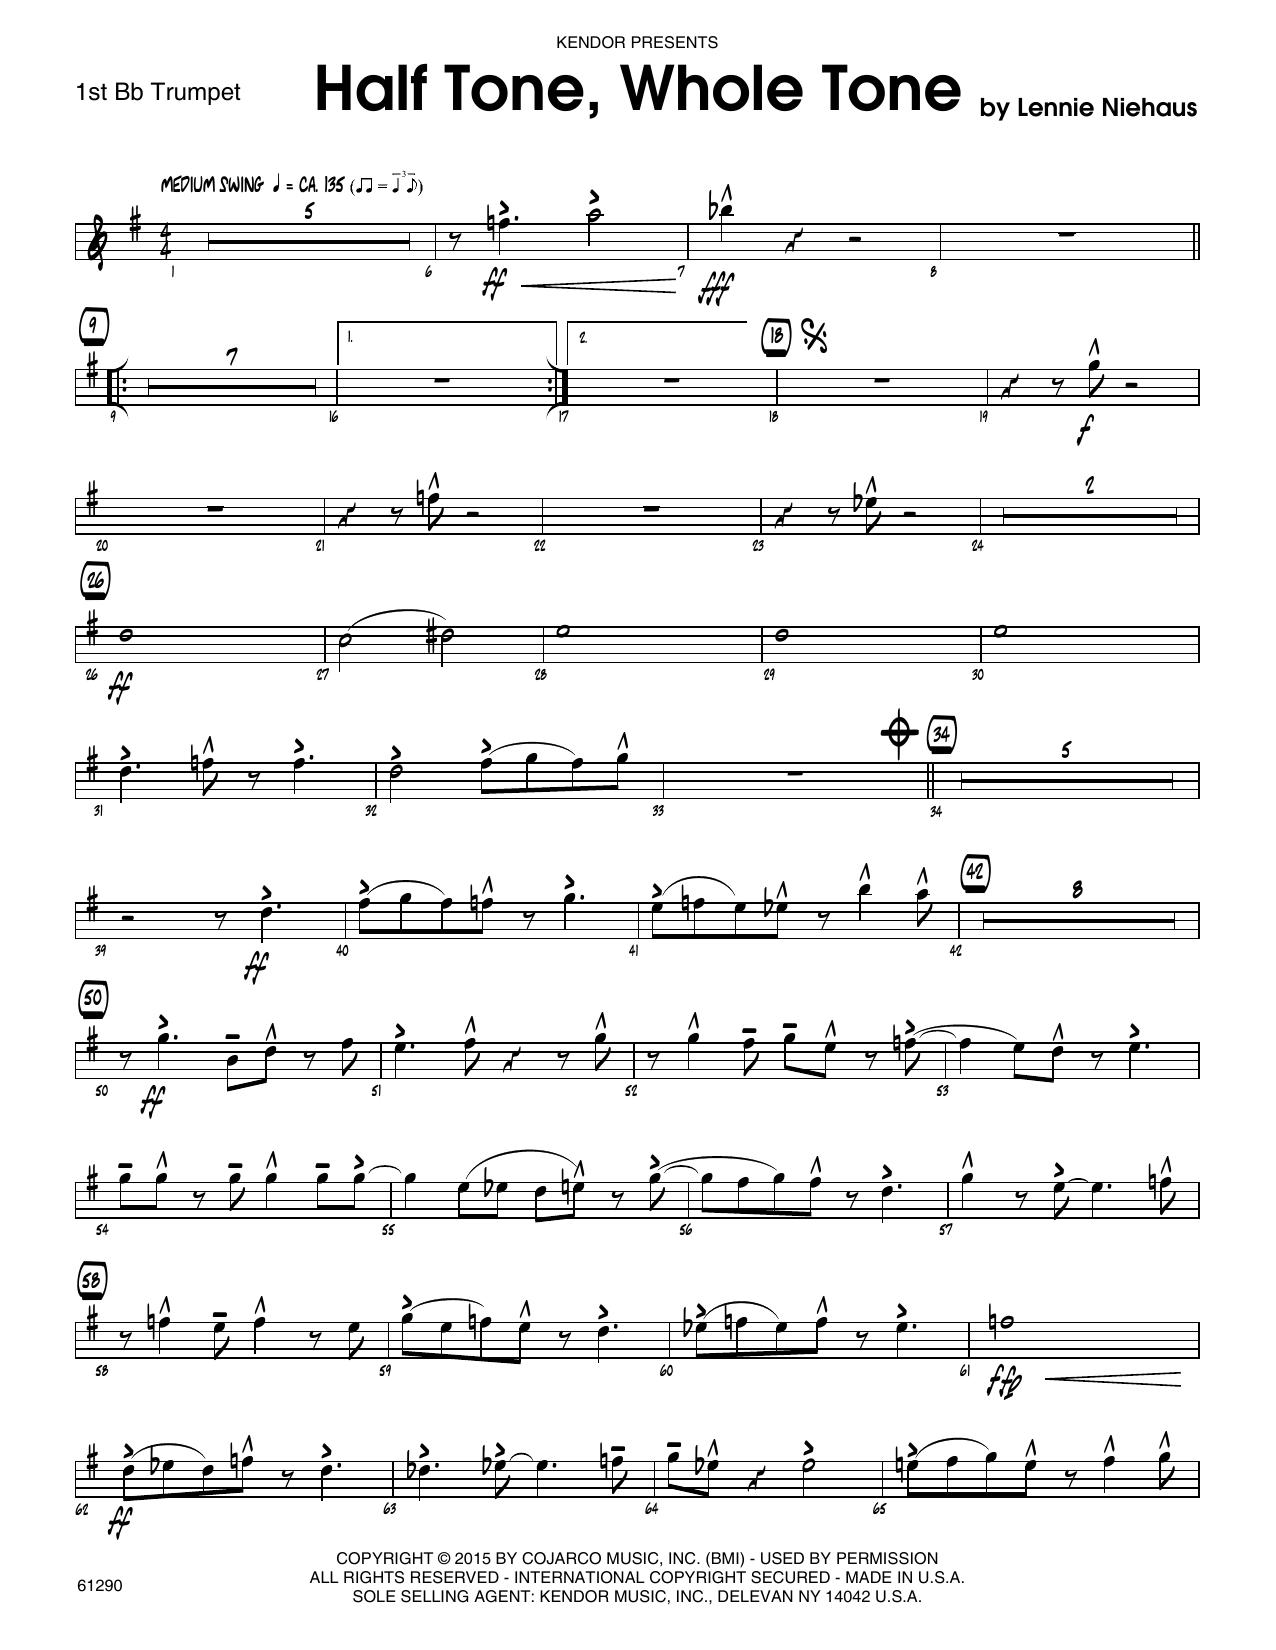 Half Tone, Whole Tone - 1st Bb Trumpet Sheet Music